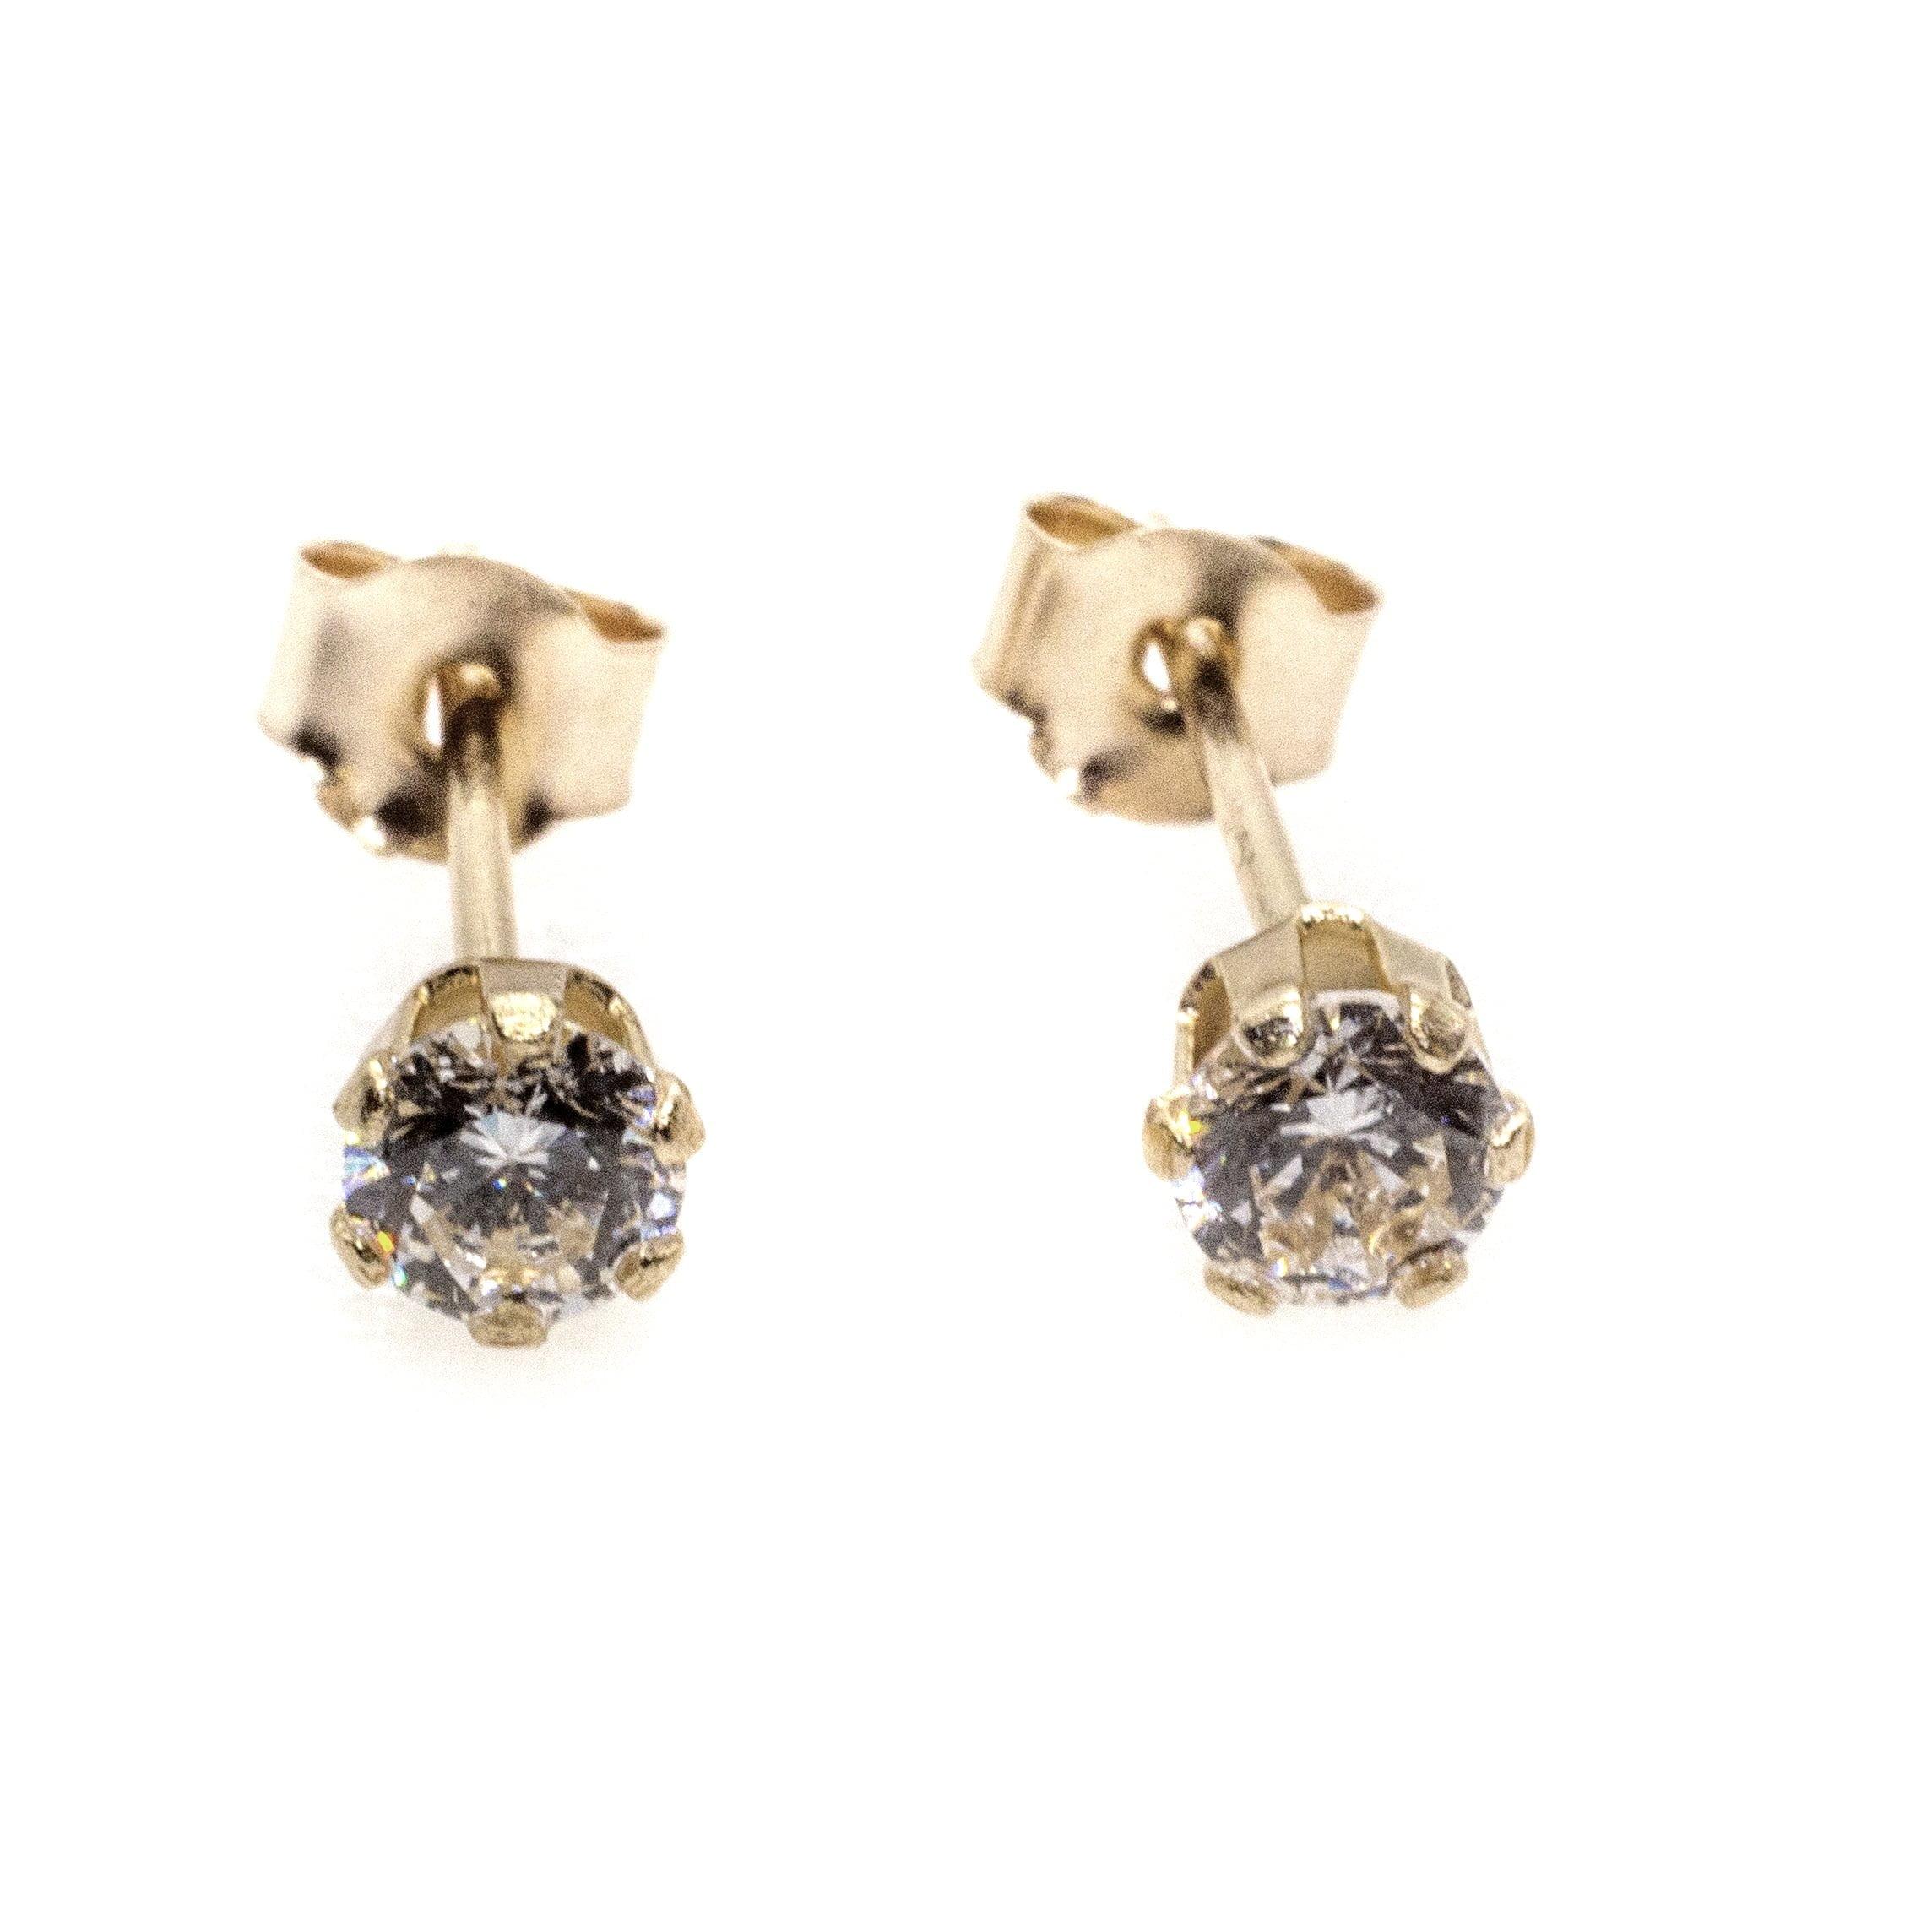 4mm CZ stud earrings 9ct yellow gold alt 1